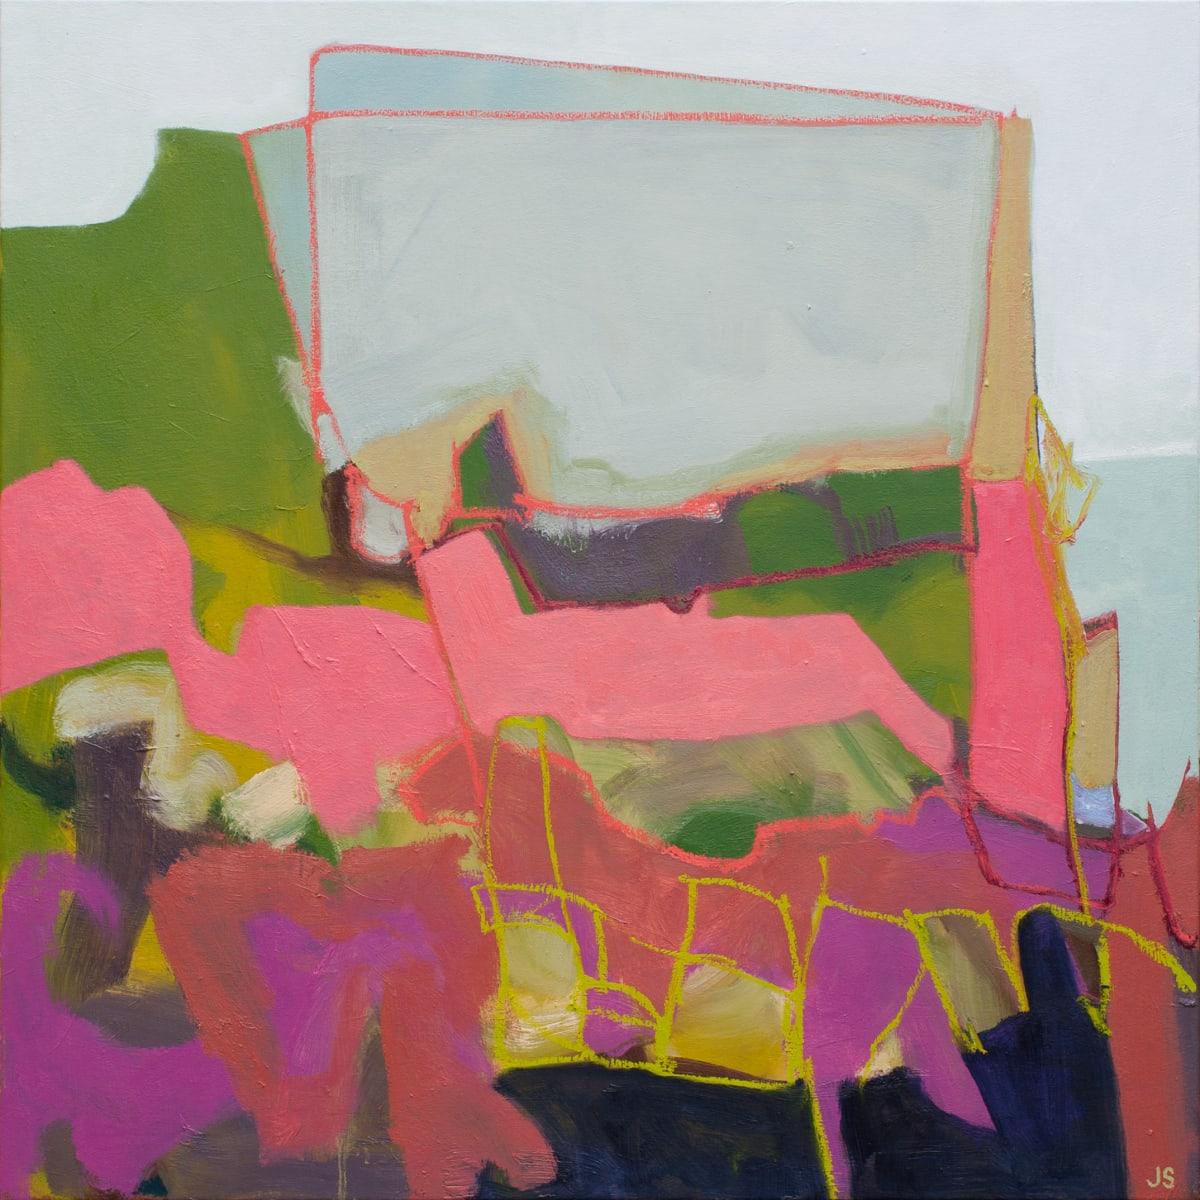 Pink Sun Fell Like Glass by Jessica Singerman